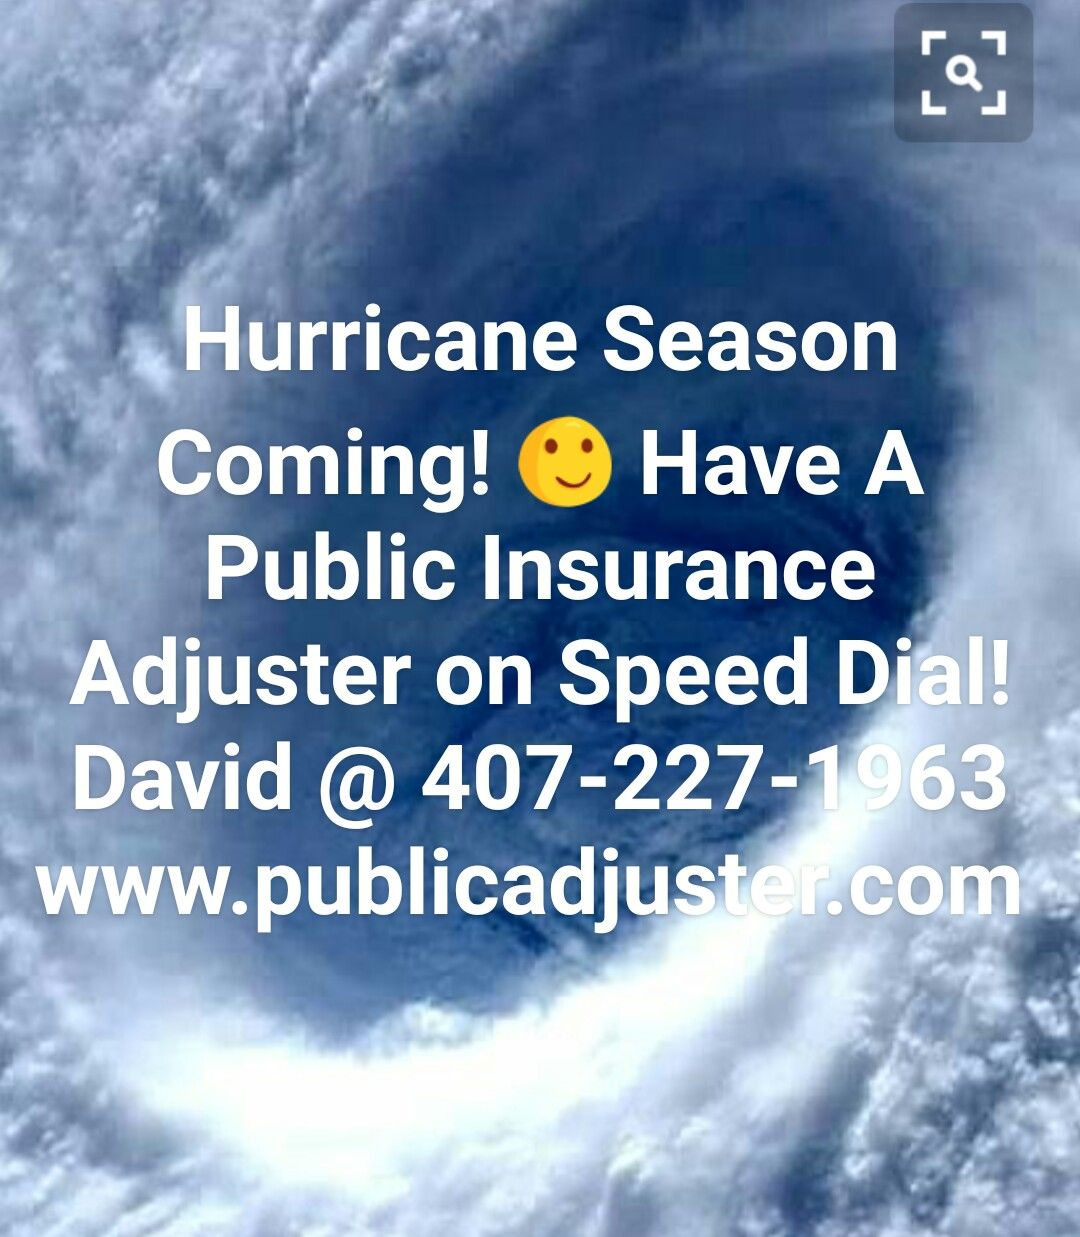 David Dwyer State Licensed Public Insurance Adjuster  407-227-1963 www.publicadjuster.com  #hurricane #hurricaneclaim